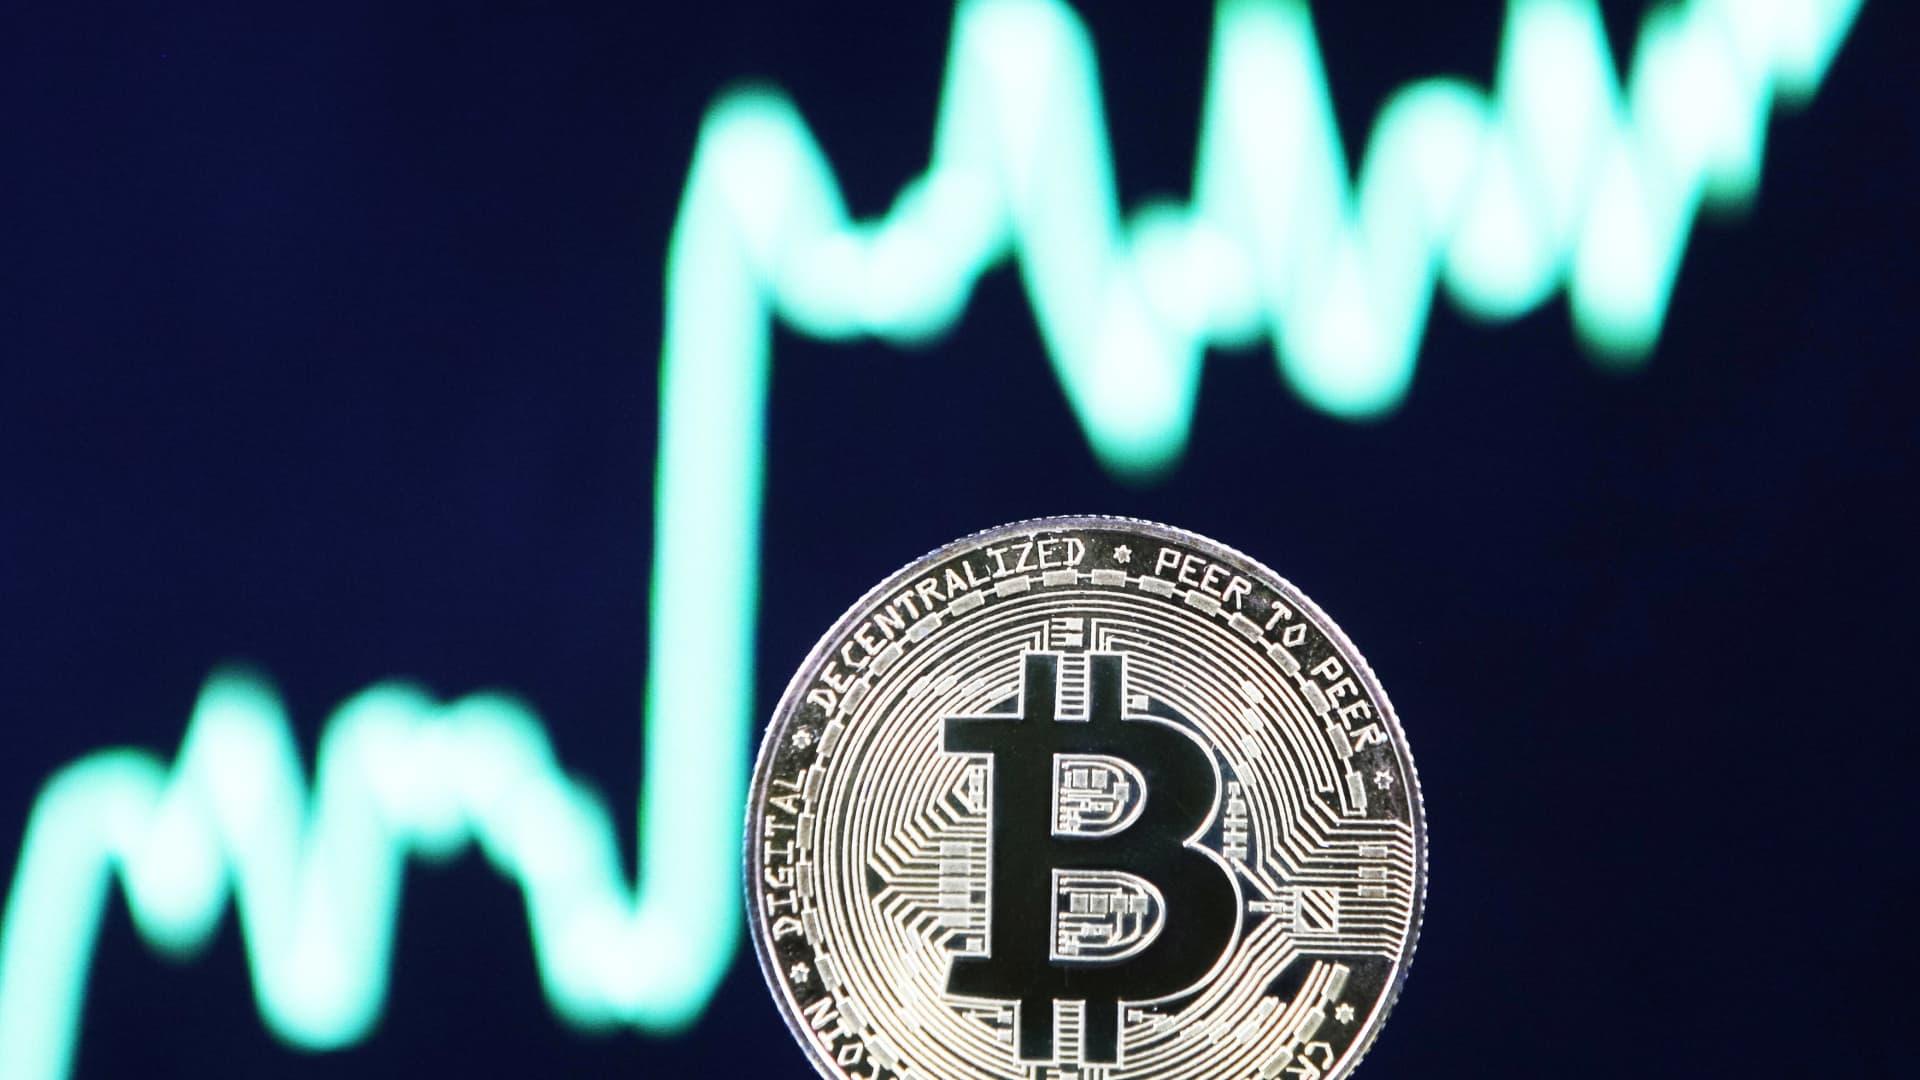 A visual representation of bitcoin.